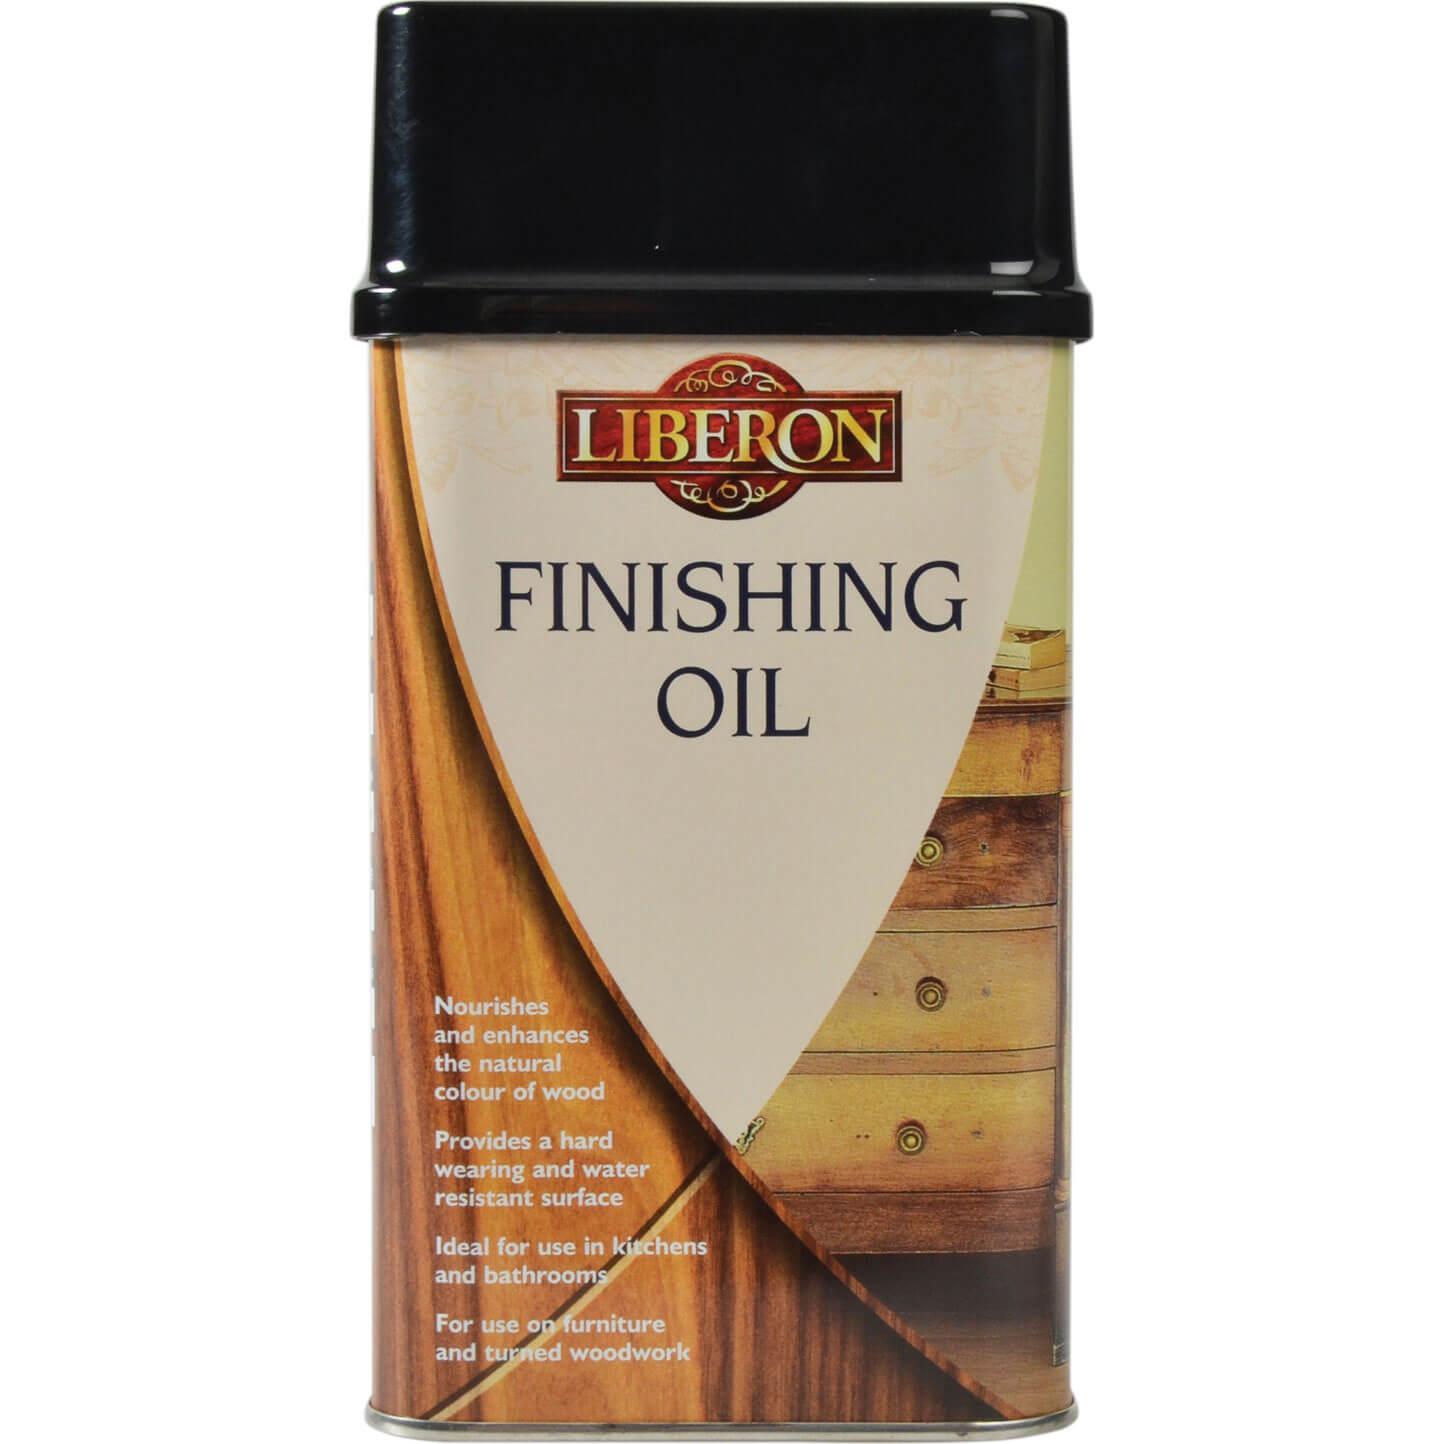 Image of Liberon Finishing Oil 500ml